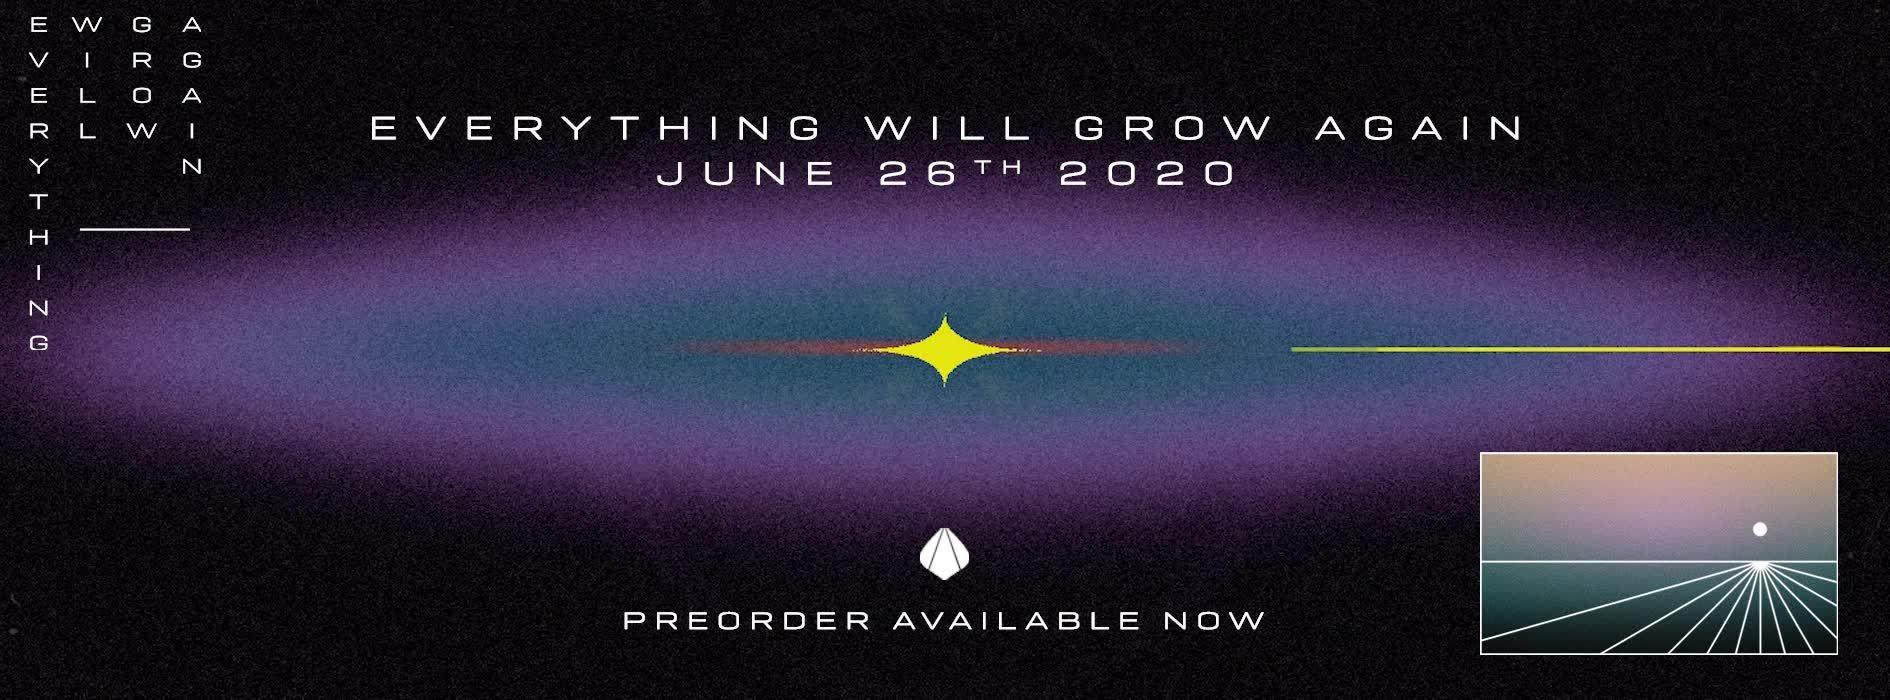 "Everything will grow again, troisième album de Fakear, incluant ""Sekoia"""